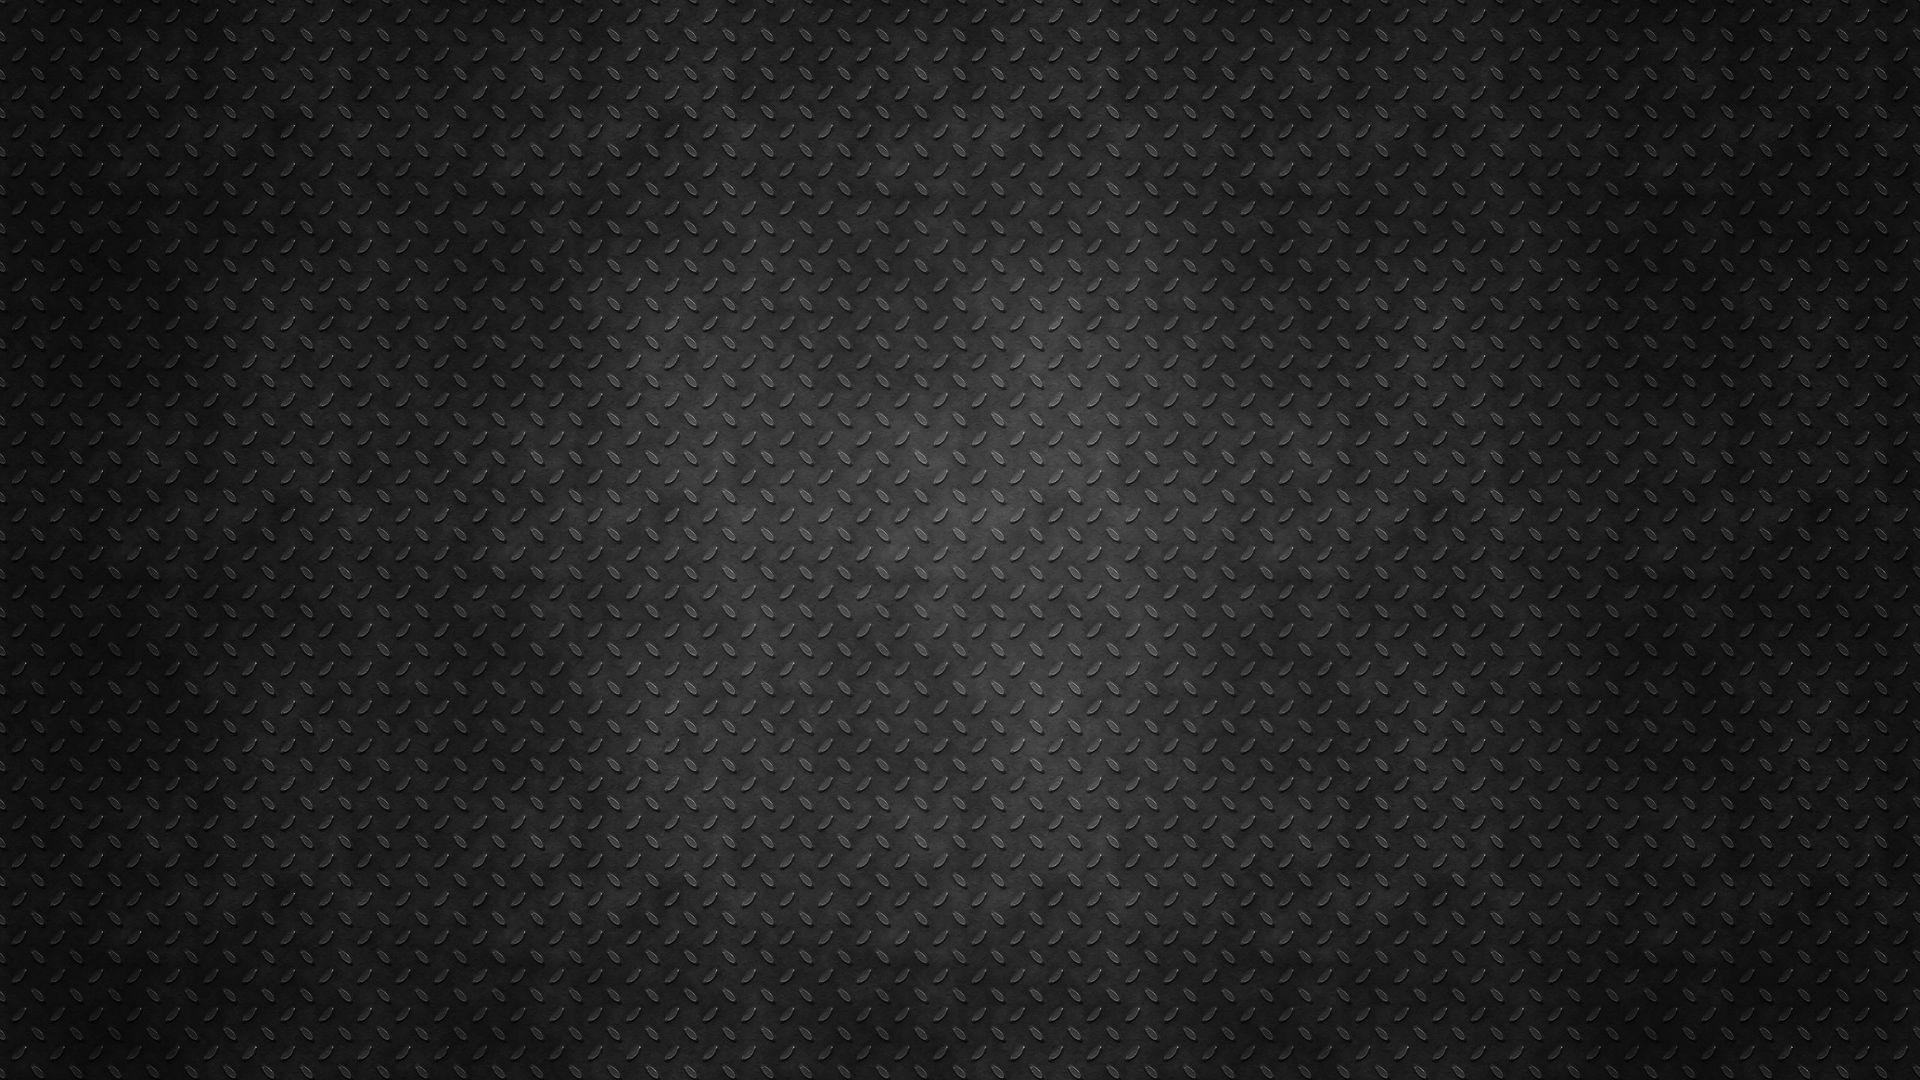 Tim Burton Nightmare Before Christmas Wallpaper 1920x1080